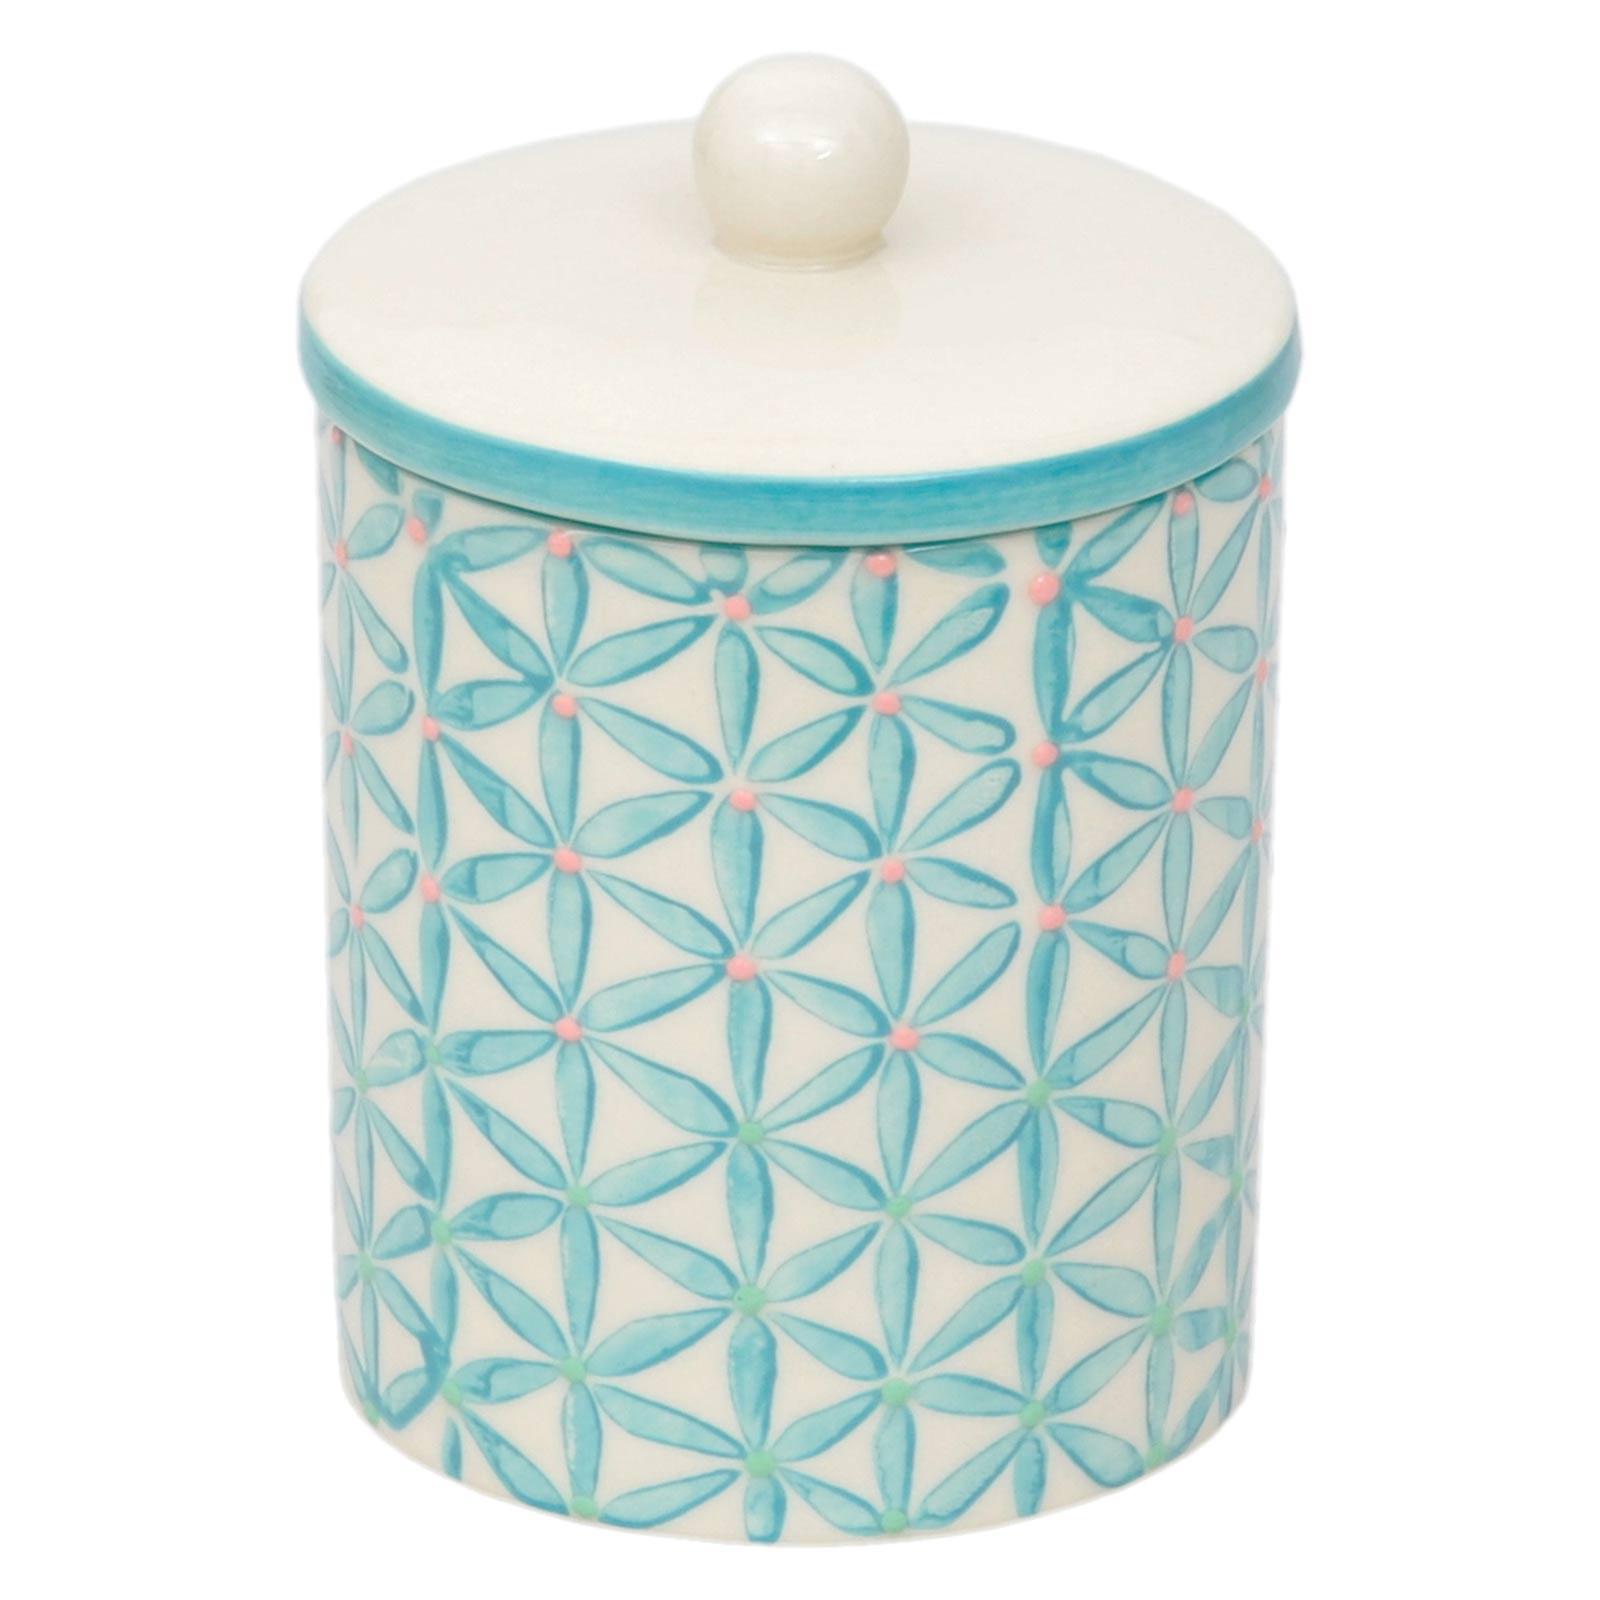 Tranquillo Keramik Aufbewahrungsdosen in trendigen Retro Design ...